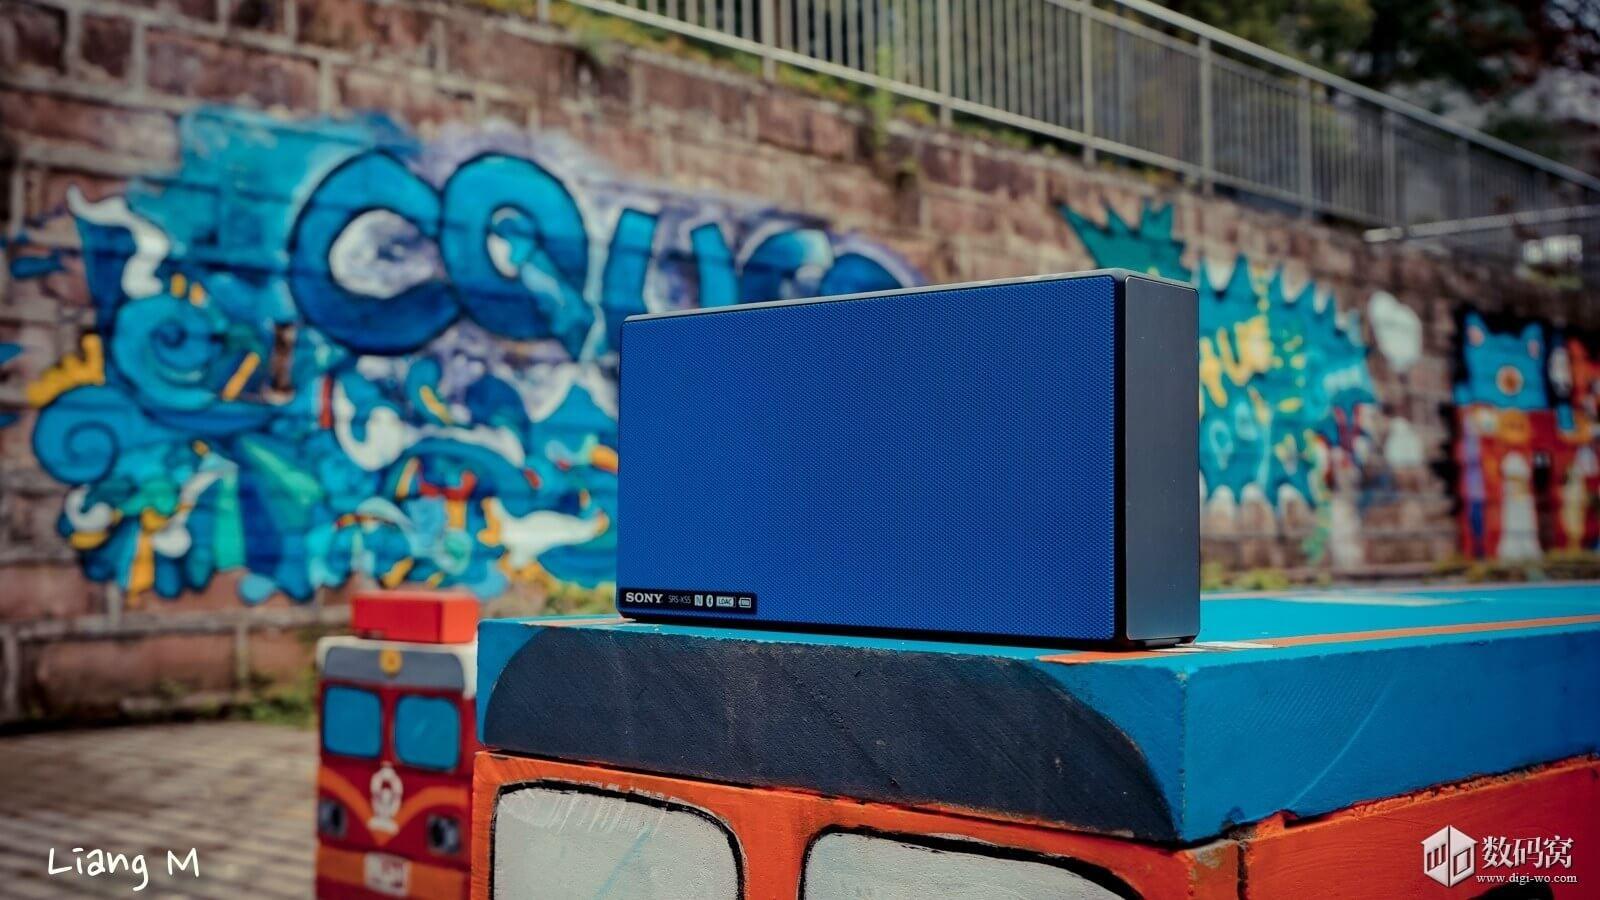 Sony SRS-X55 Speaker hands on